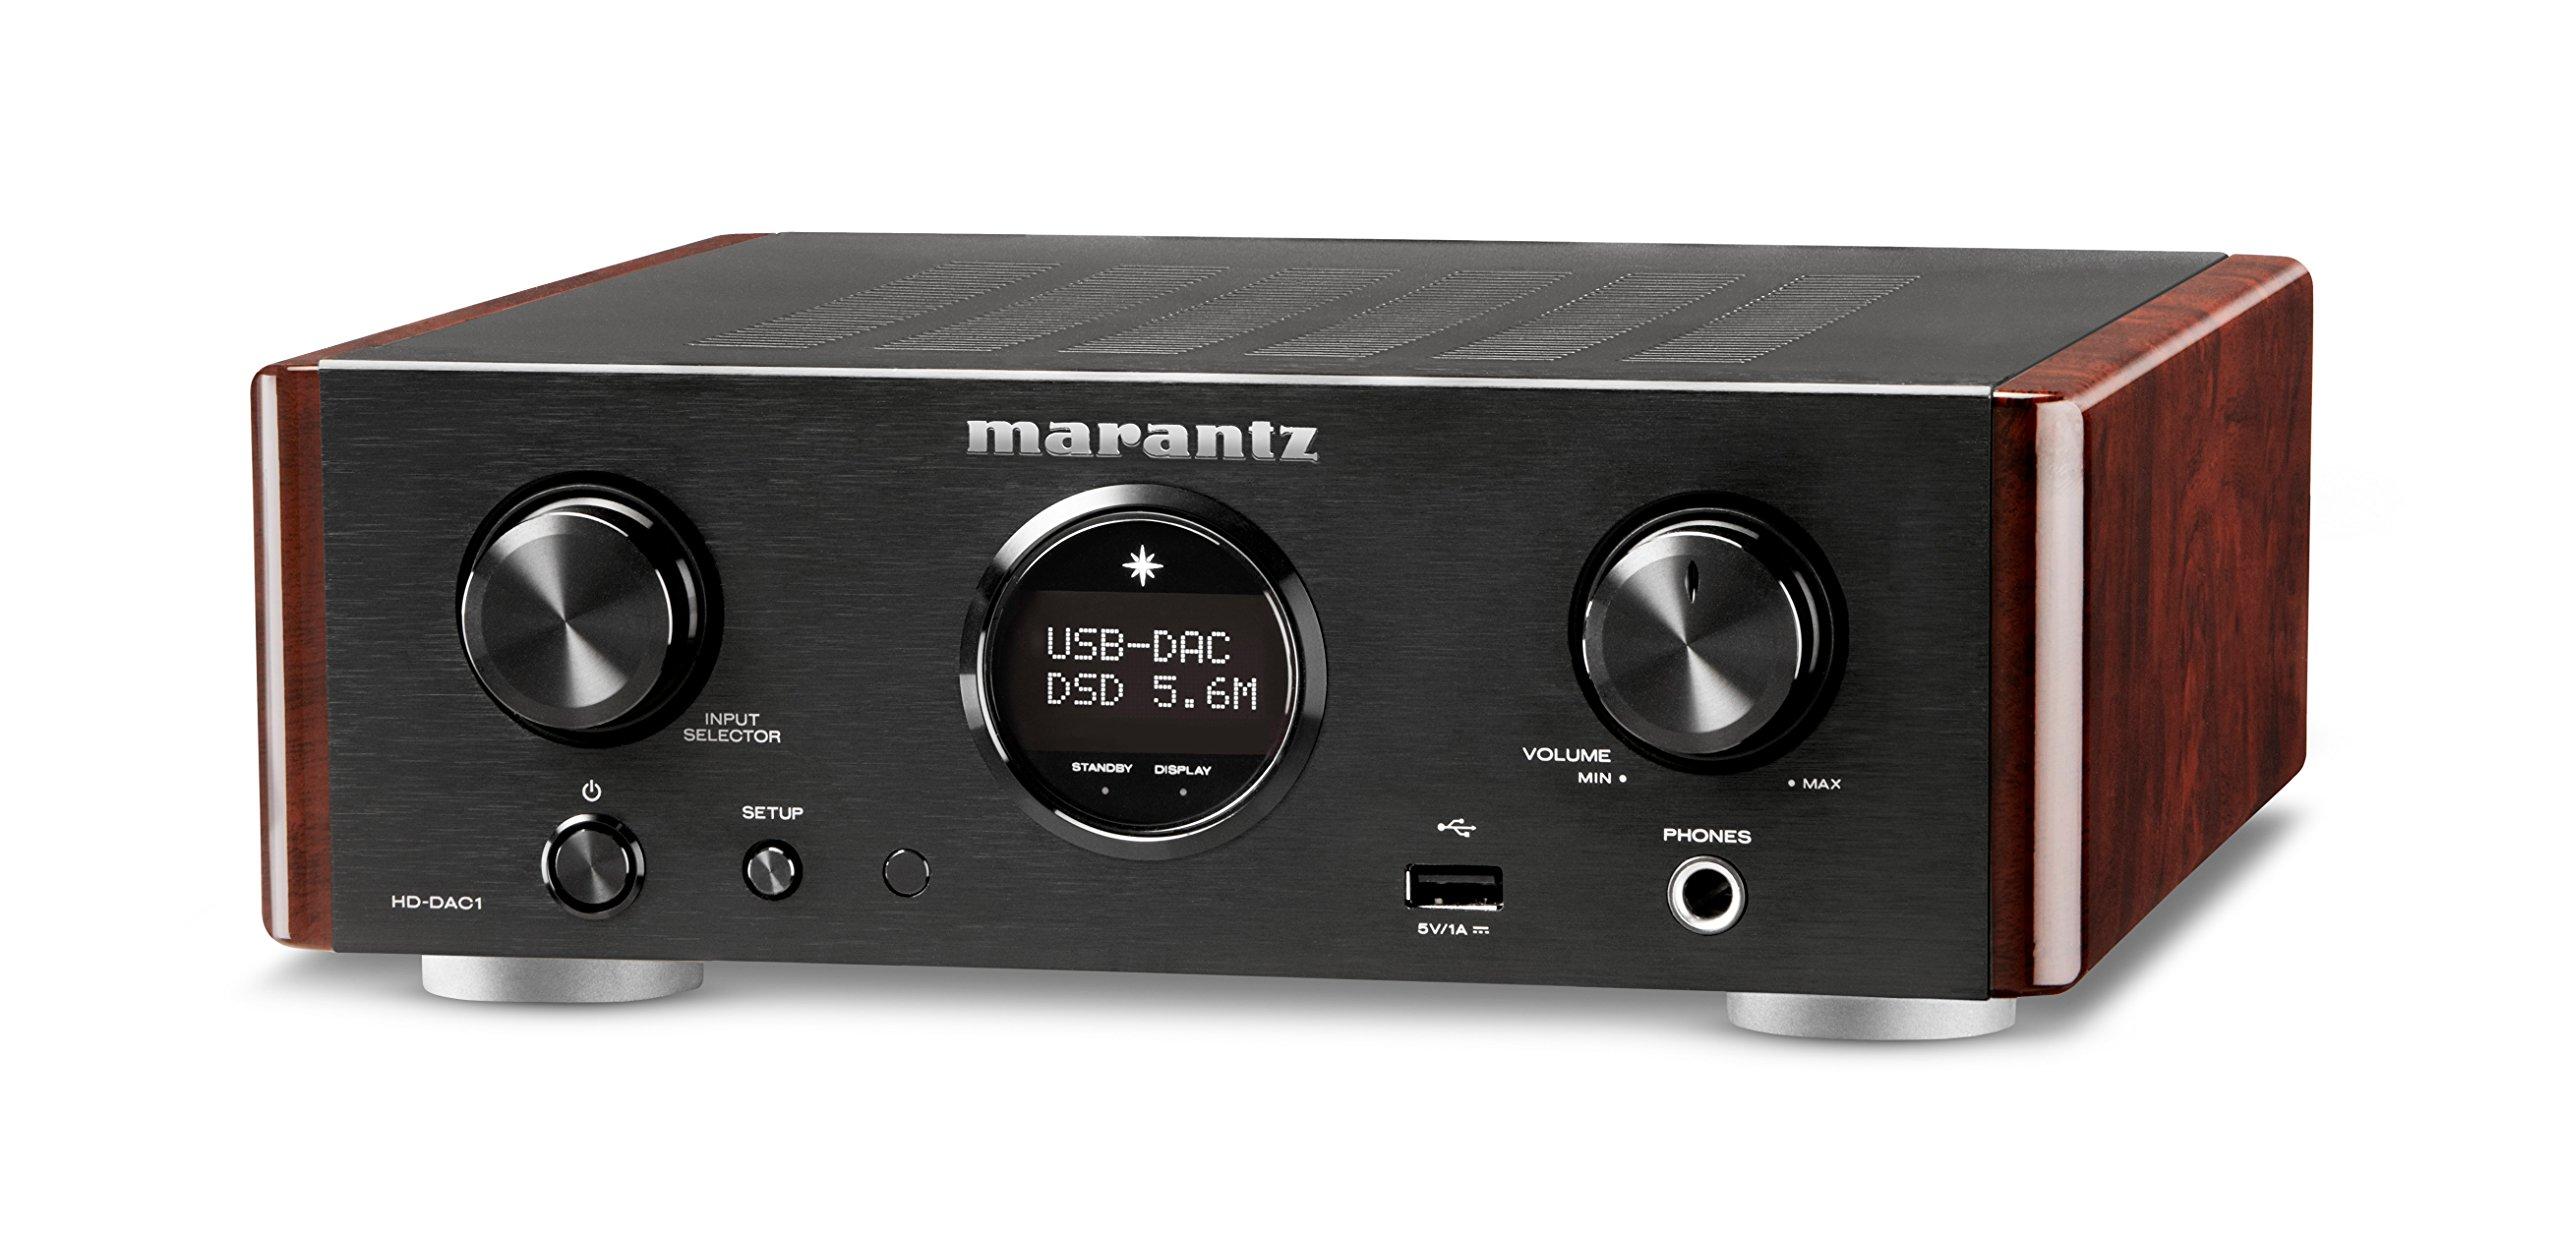 Marantz HD- DAC1High Definition USB DAC / Headphone Amp by Marantz (Image #1)